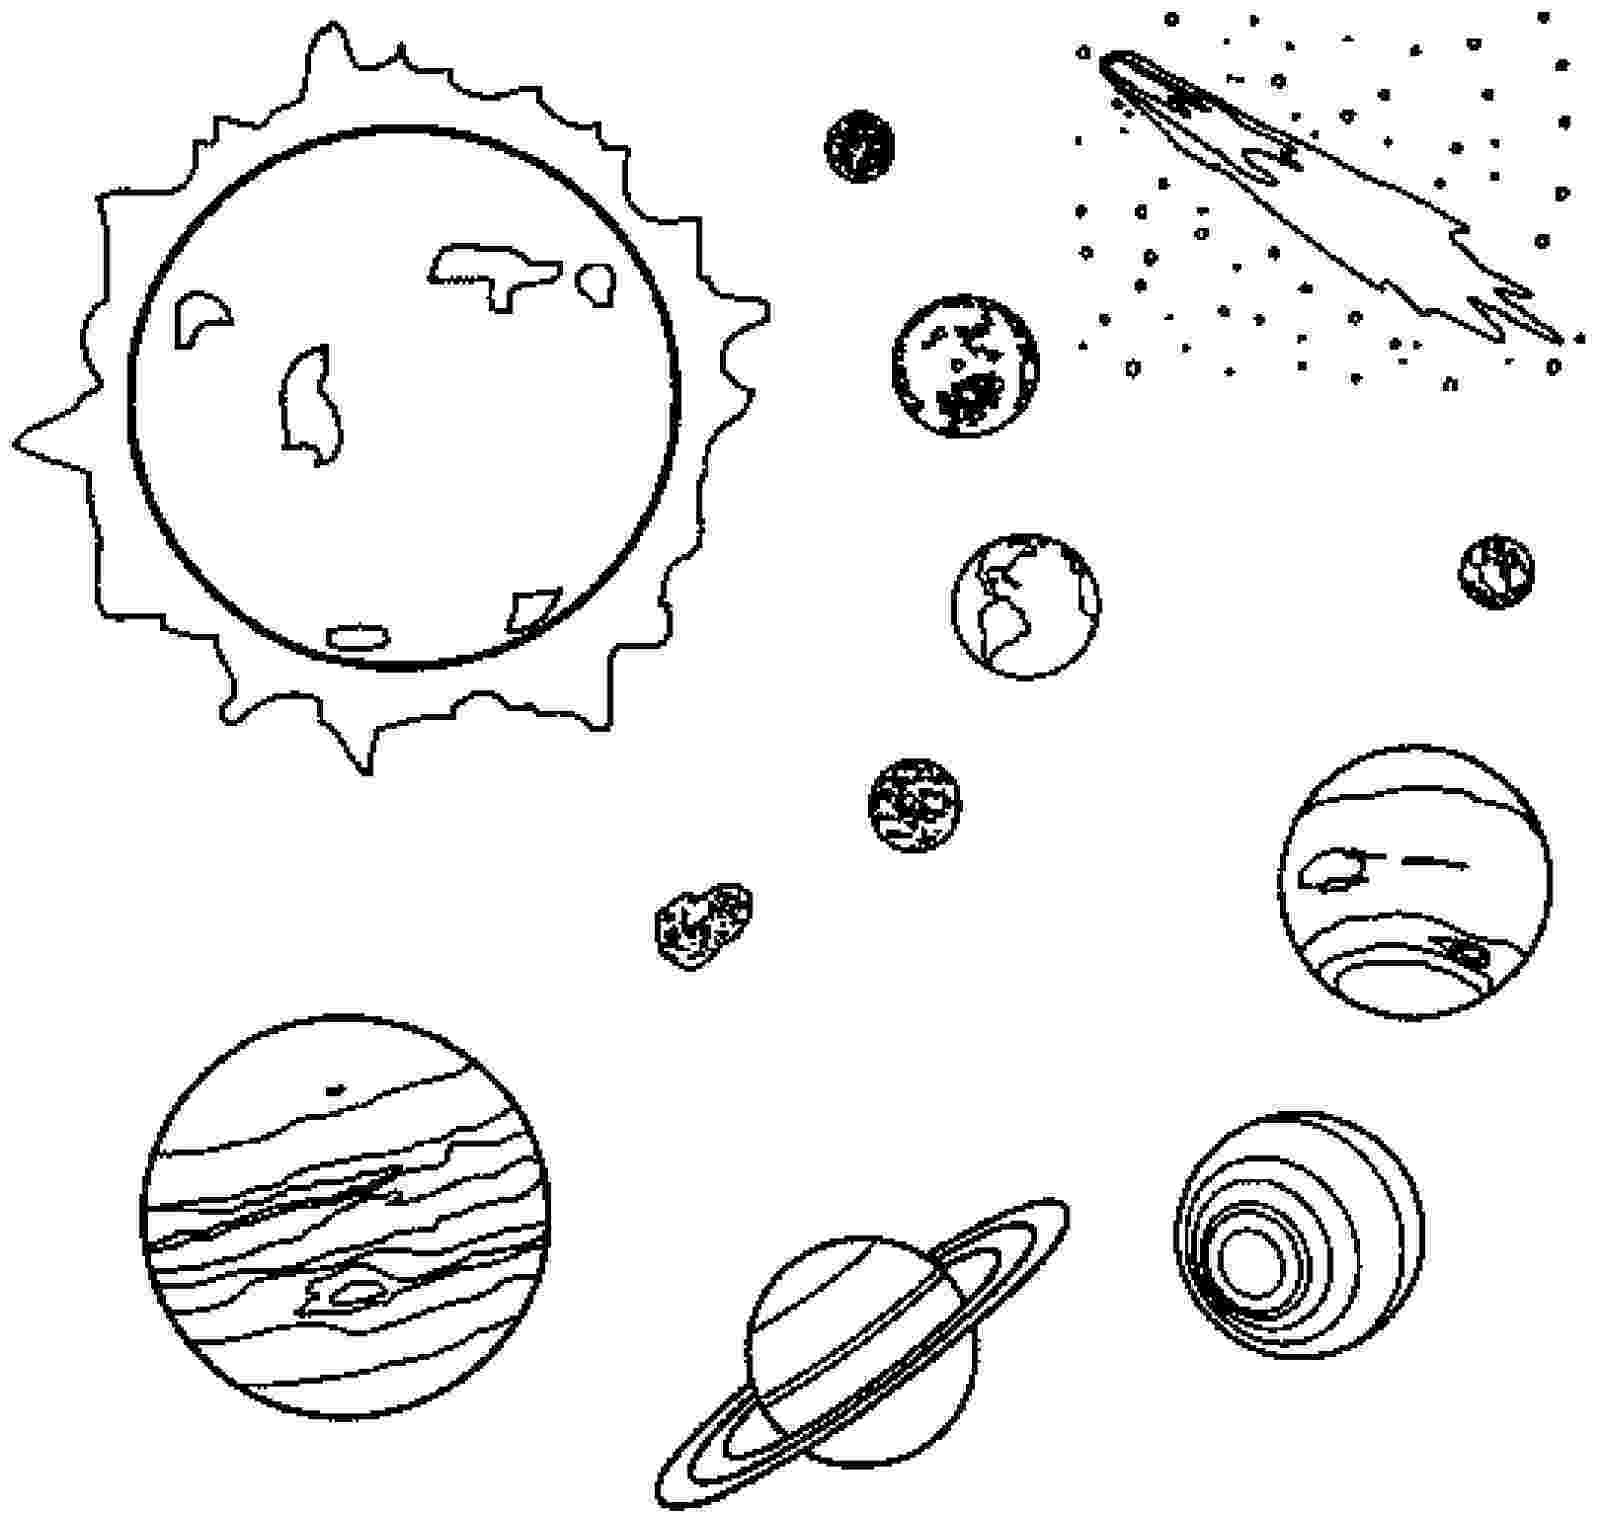 planet colouring sheets ausmalbilder für kinder malvorlagen und malbuch planet colouring planet sheets